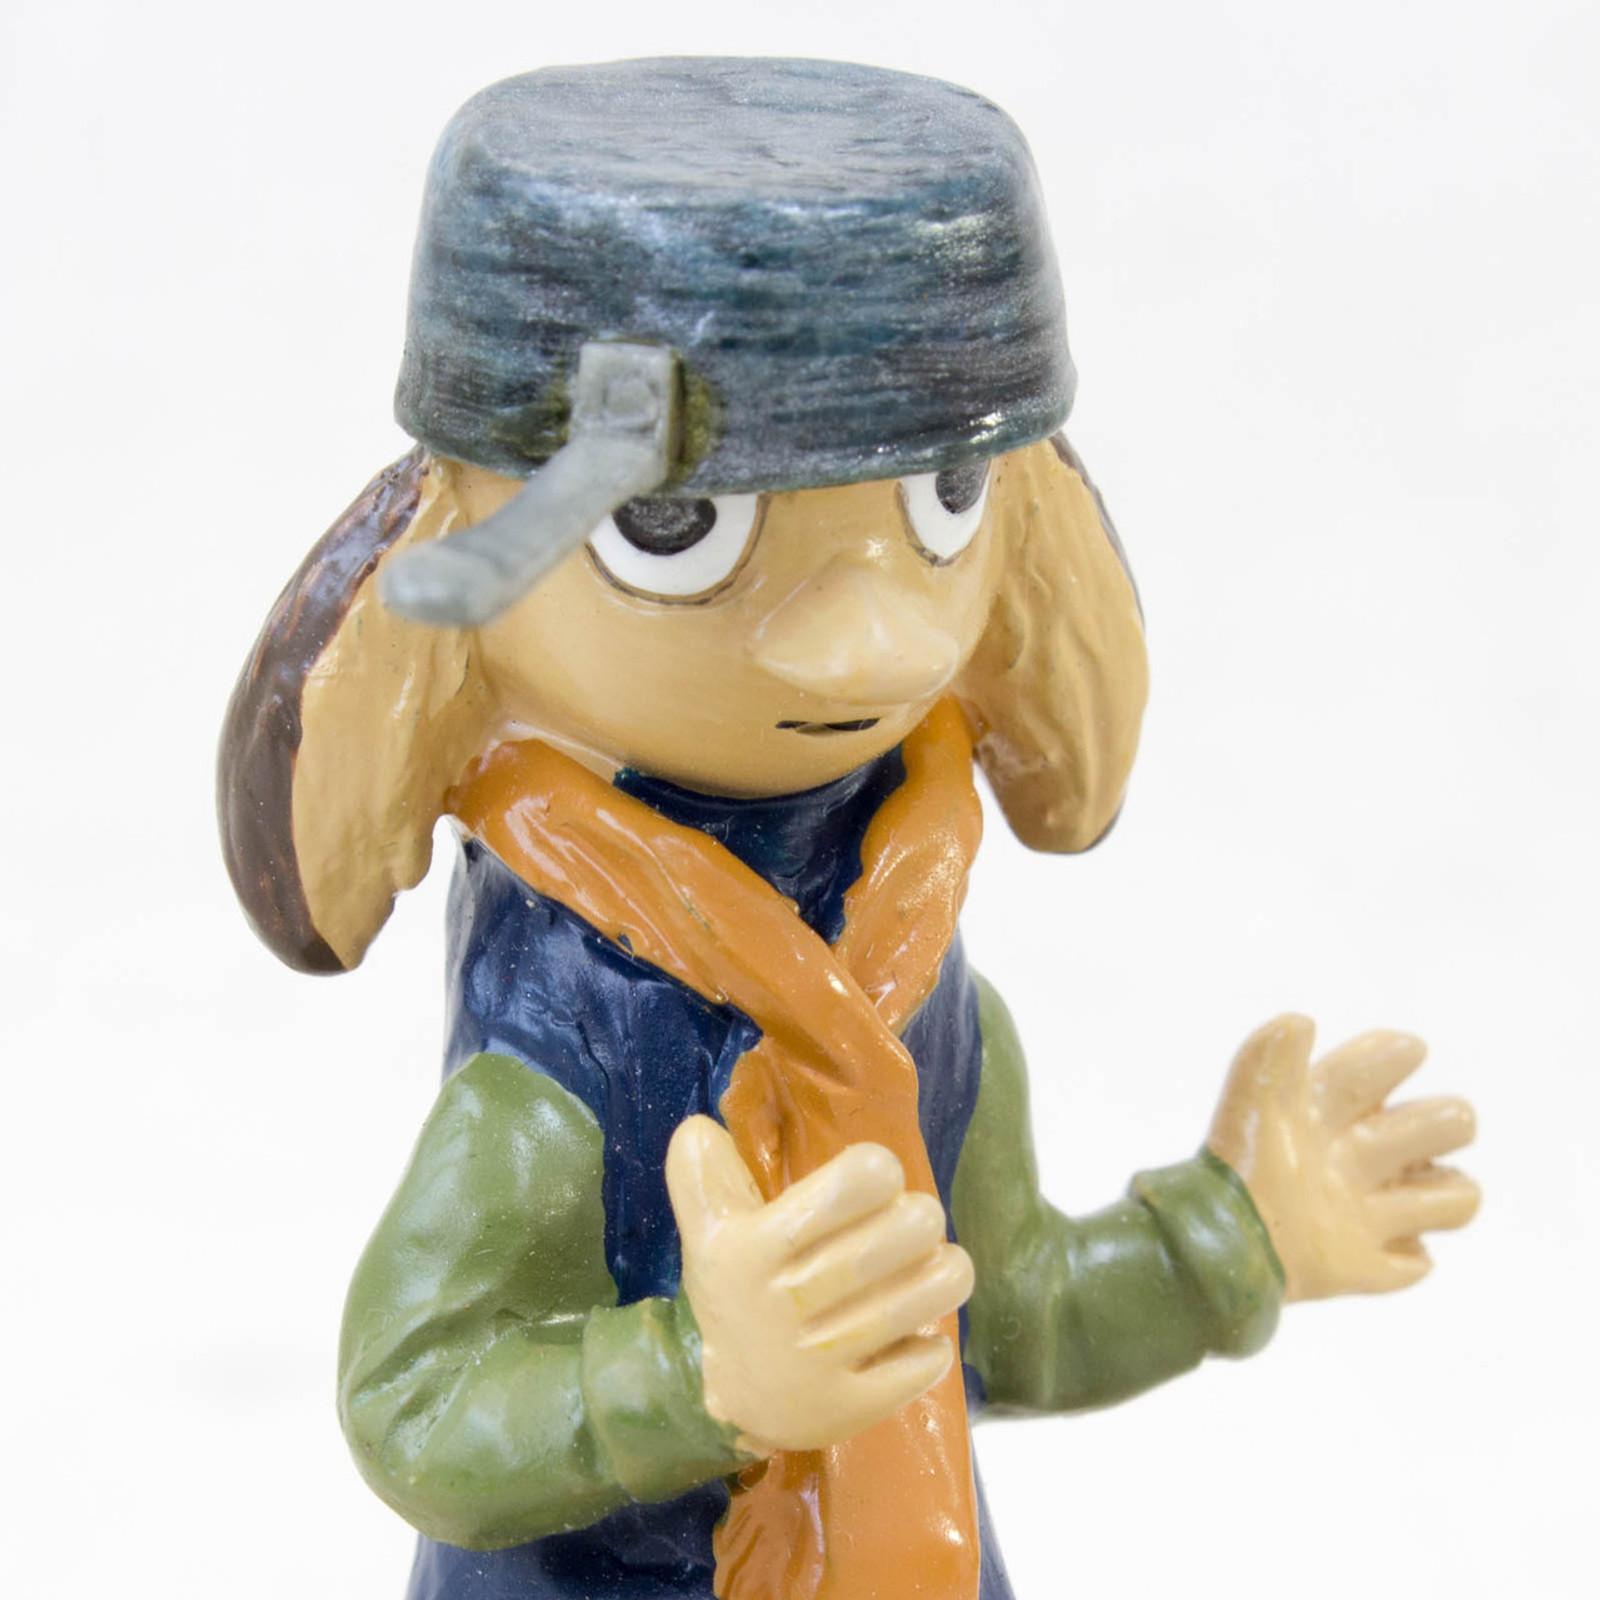 RARE! Moomin Characters The Muddler Original Comics Ver. Mini Figure Benelic